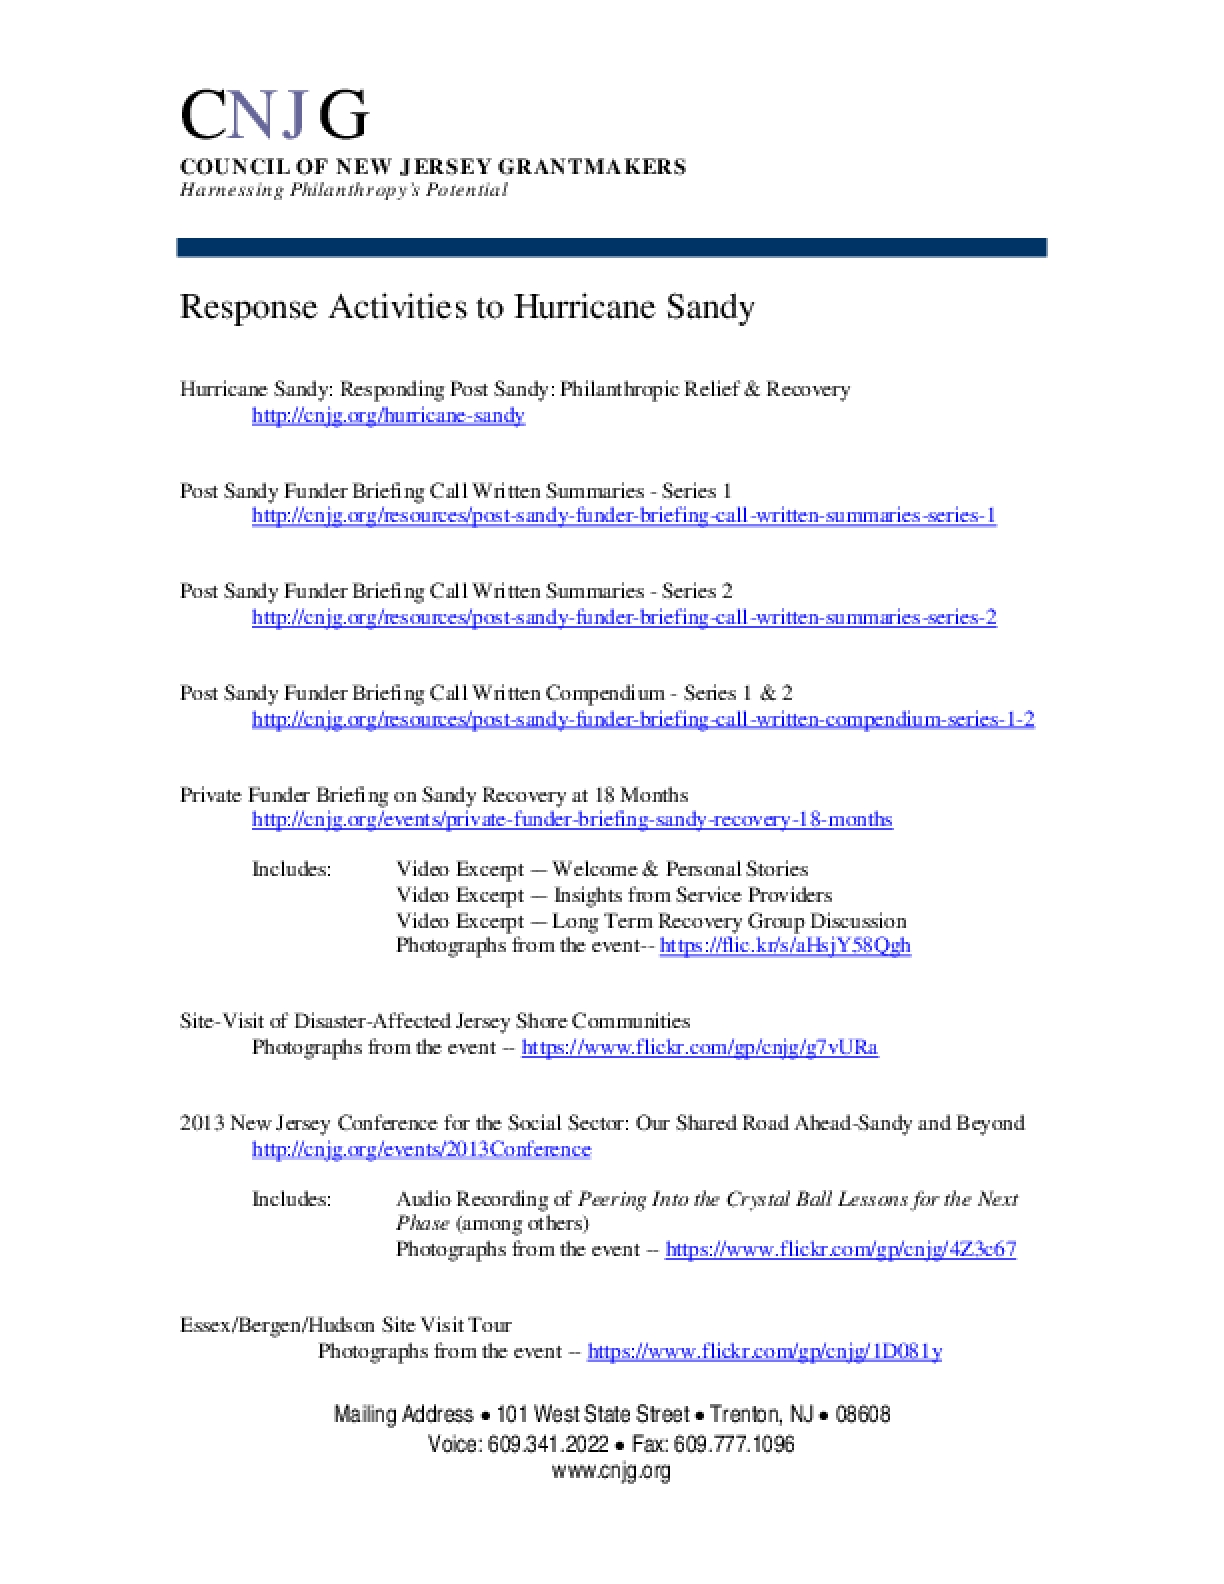 Response Activities to Hurrican Sandy